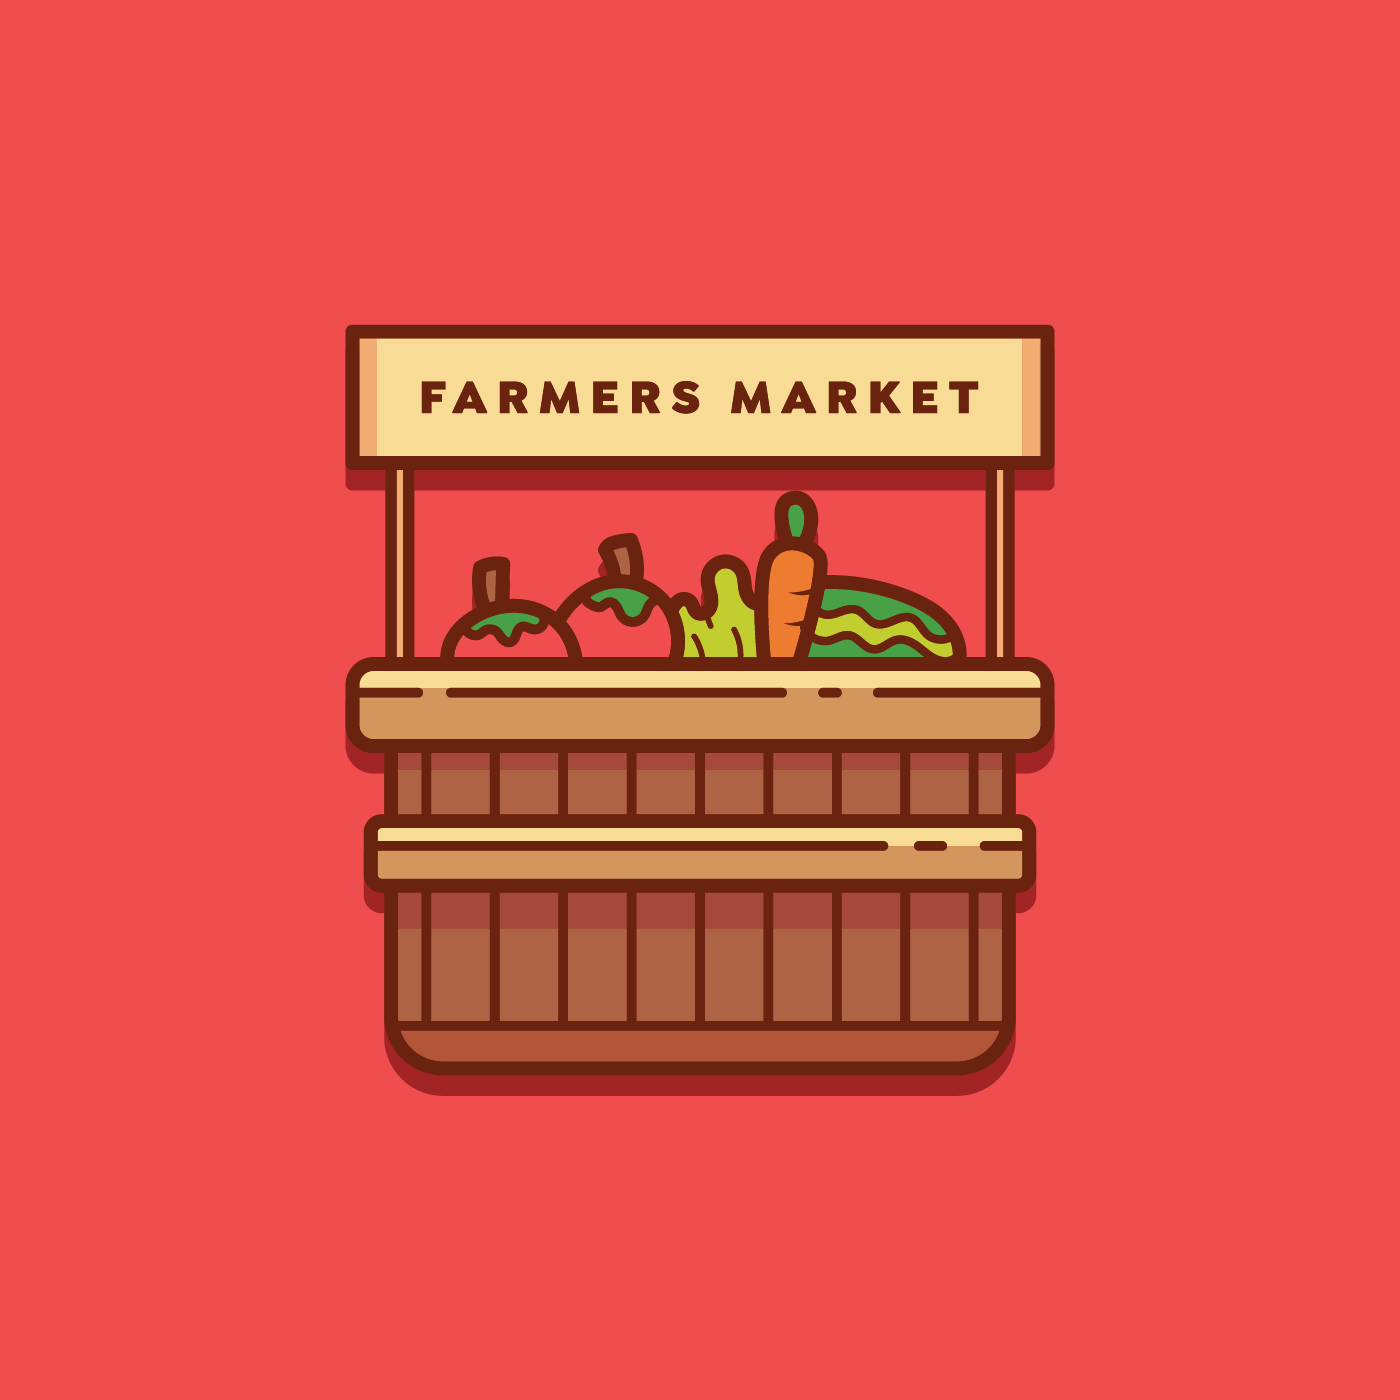 farmers market logo vector download free vector art